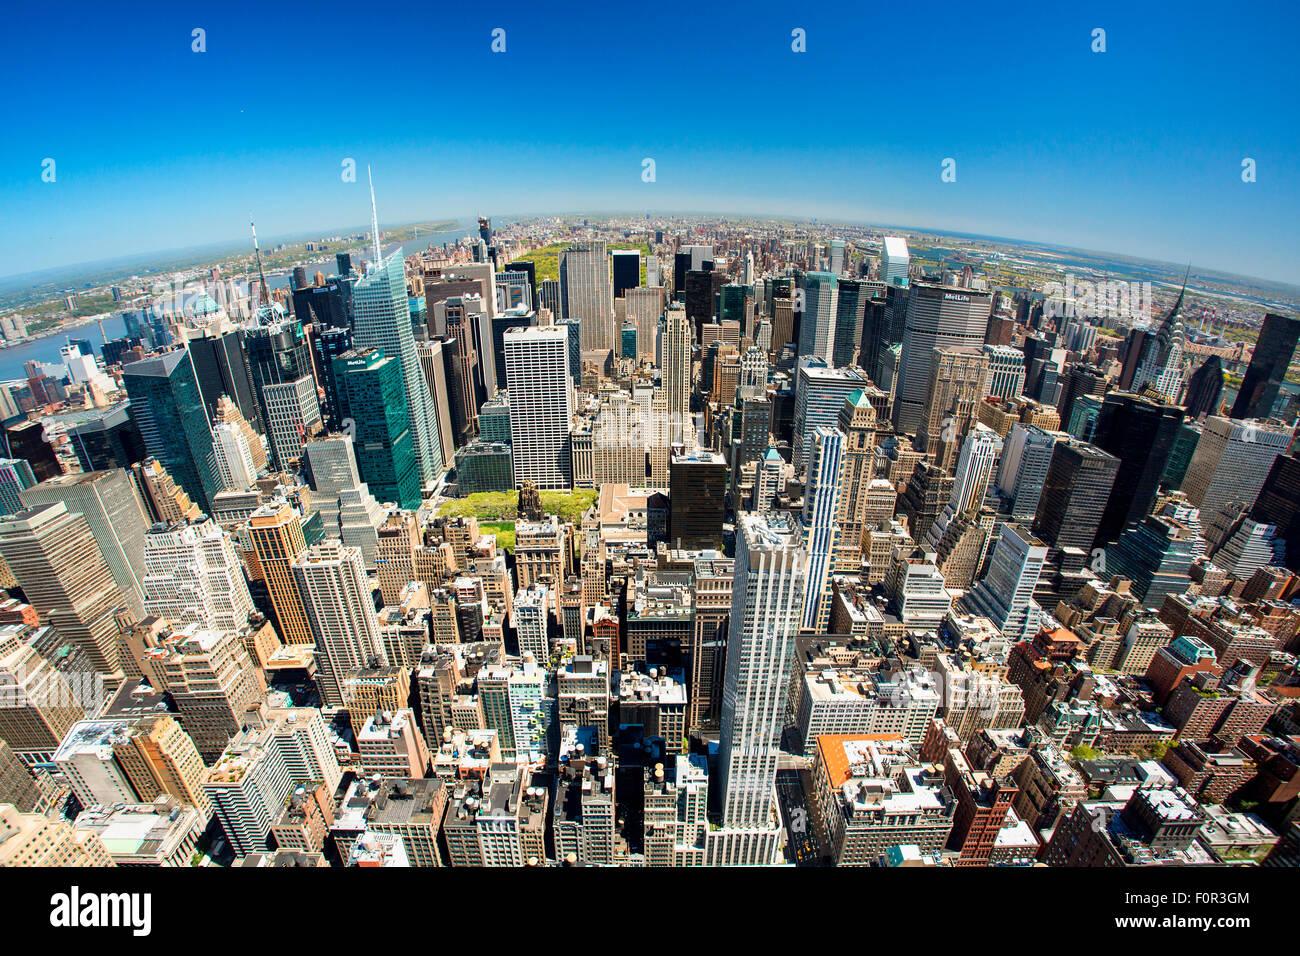 New York City Skyline Photo Stock